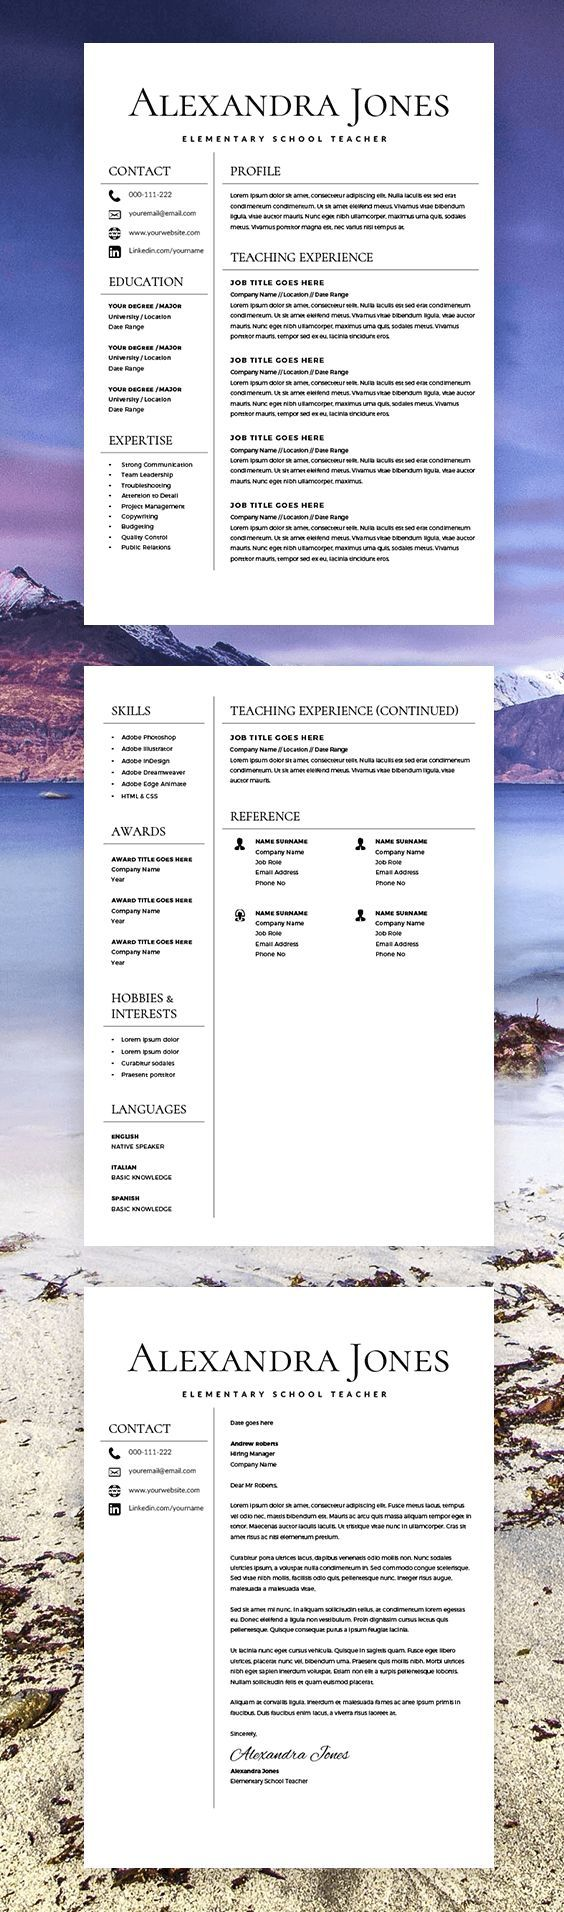 9 best jobb images on Pinterest | Resume templates, Resume and ...